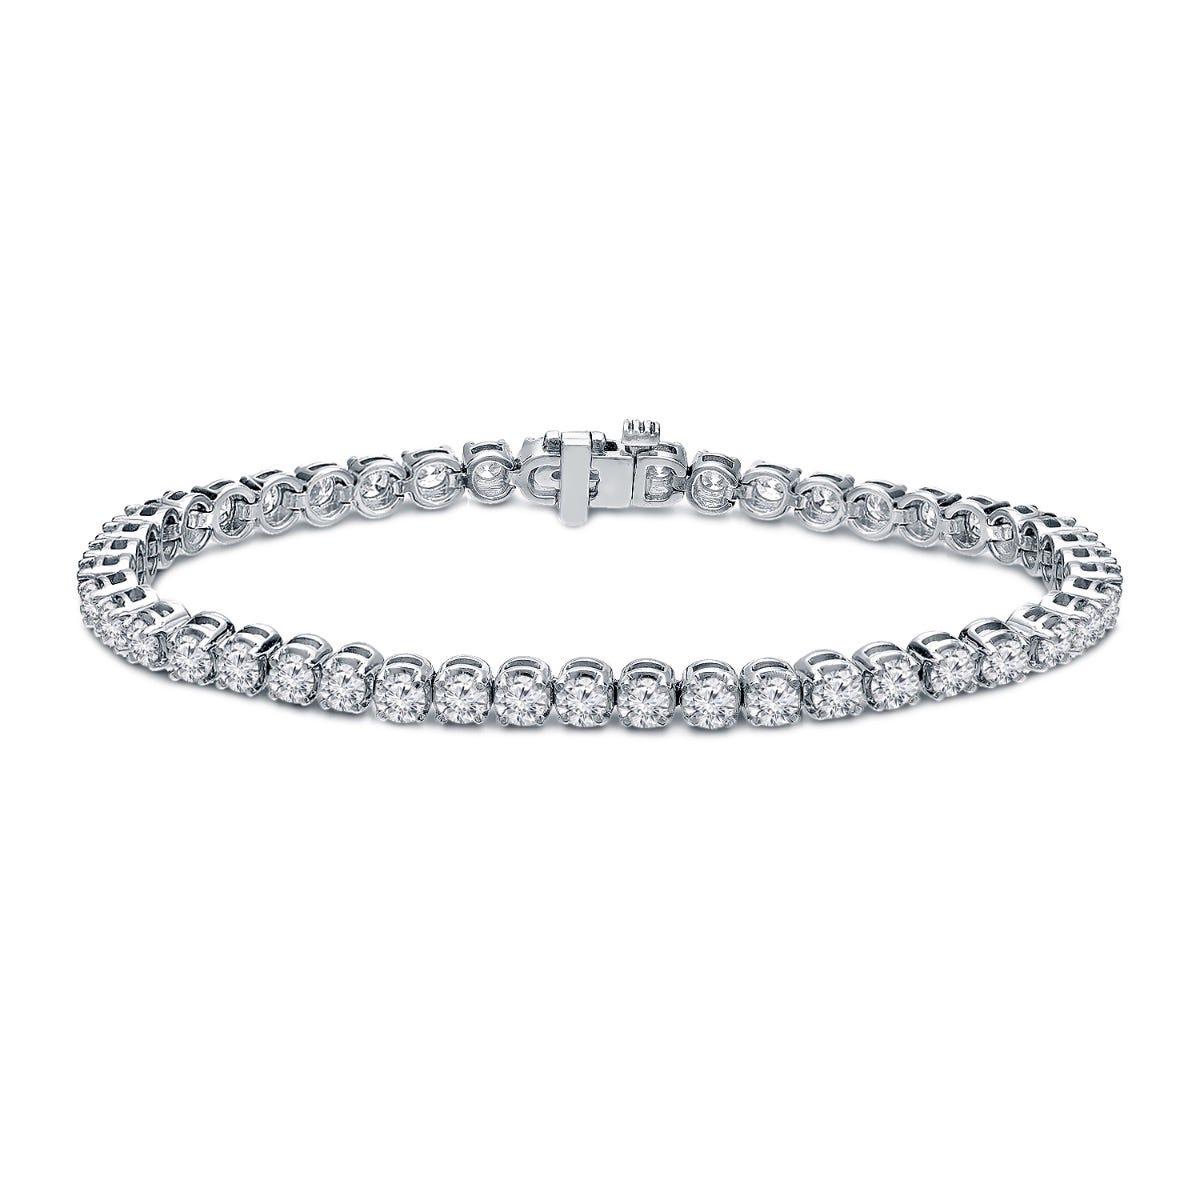 6ctw. 4-Prong Round Link Diamond Tennis Bracelet in 14K White Gold (HI, VS1-VS2, 45-Stone)